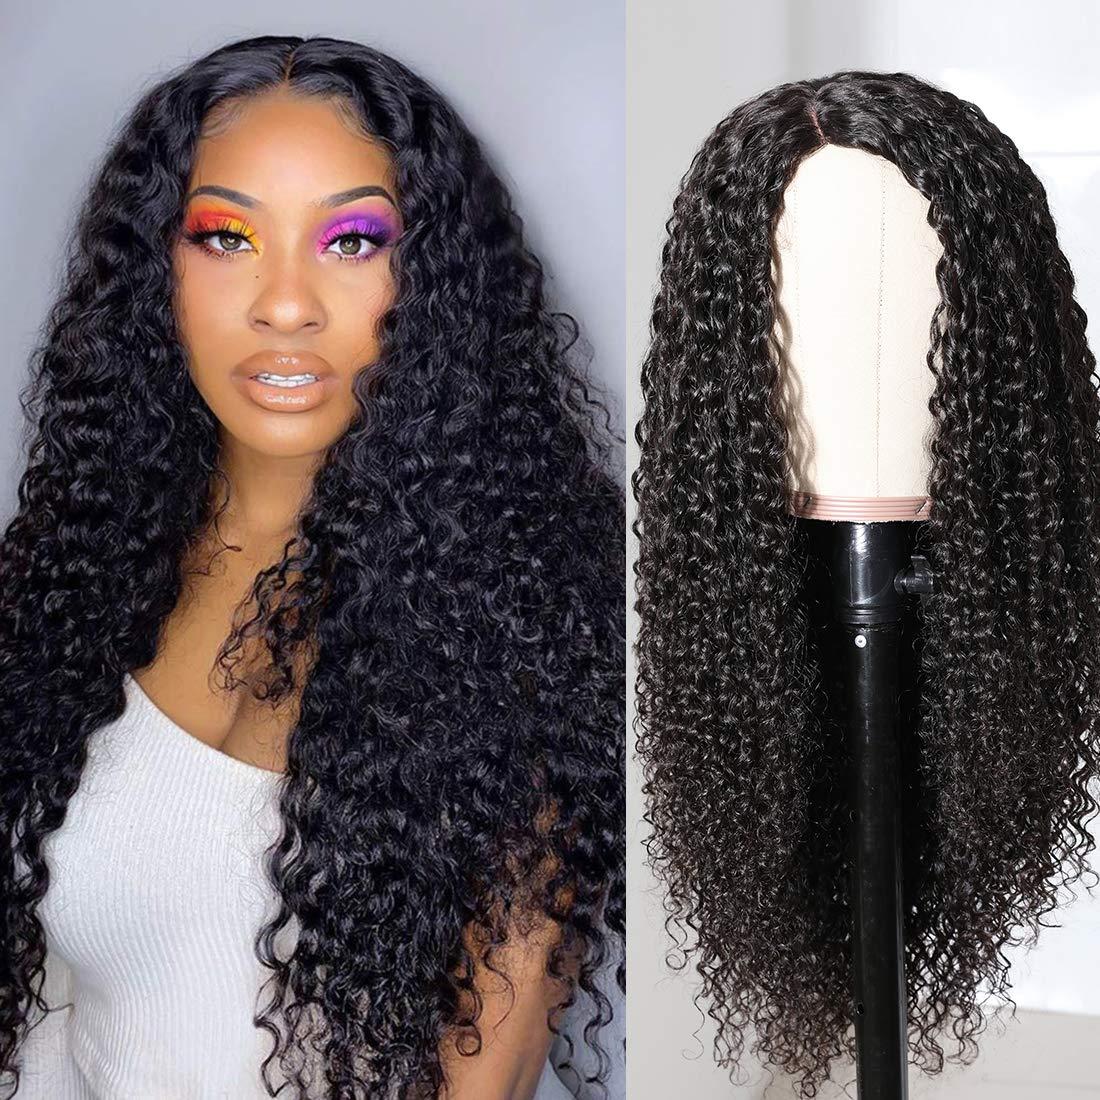 Nadula Brazilian Curly Wig Fake Scalp Premade Human Hair Wigs 10A Pu Silk Base Wig Go and Wear Wigs for Women 150% Density No tangle No Shedding (24inch)